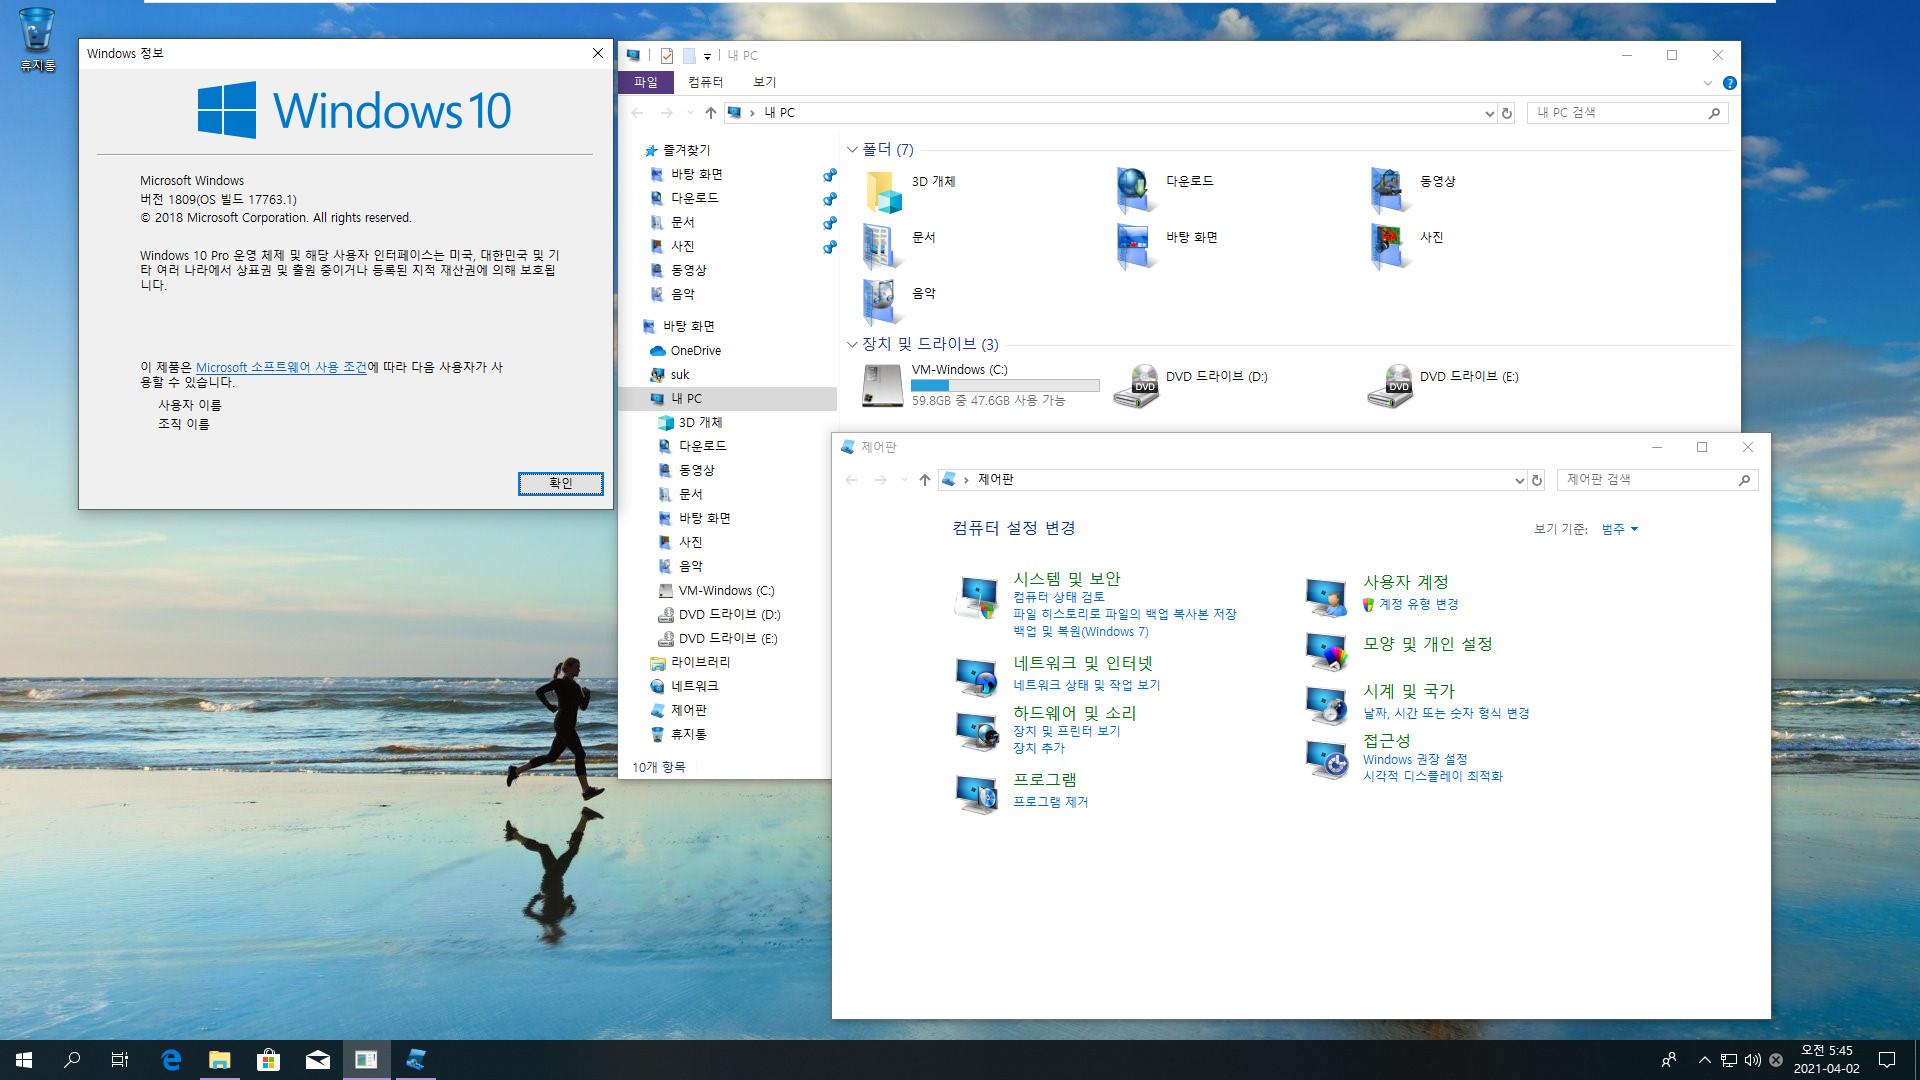 imageres.dll 적용하면 부팅이 안 되는 윈도우는 imageres.dll 2개를 합치면 부팅 됩니다 2021-04-02_054528.jpg